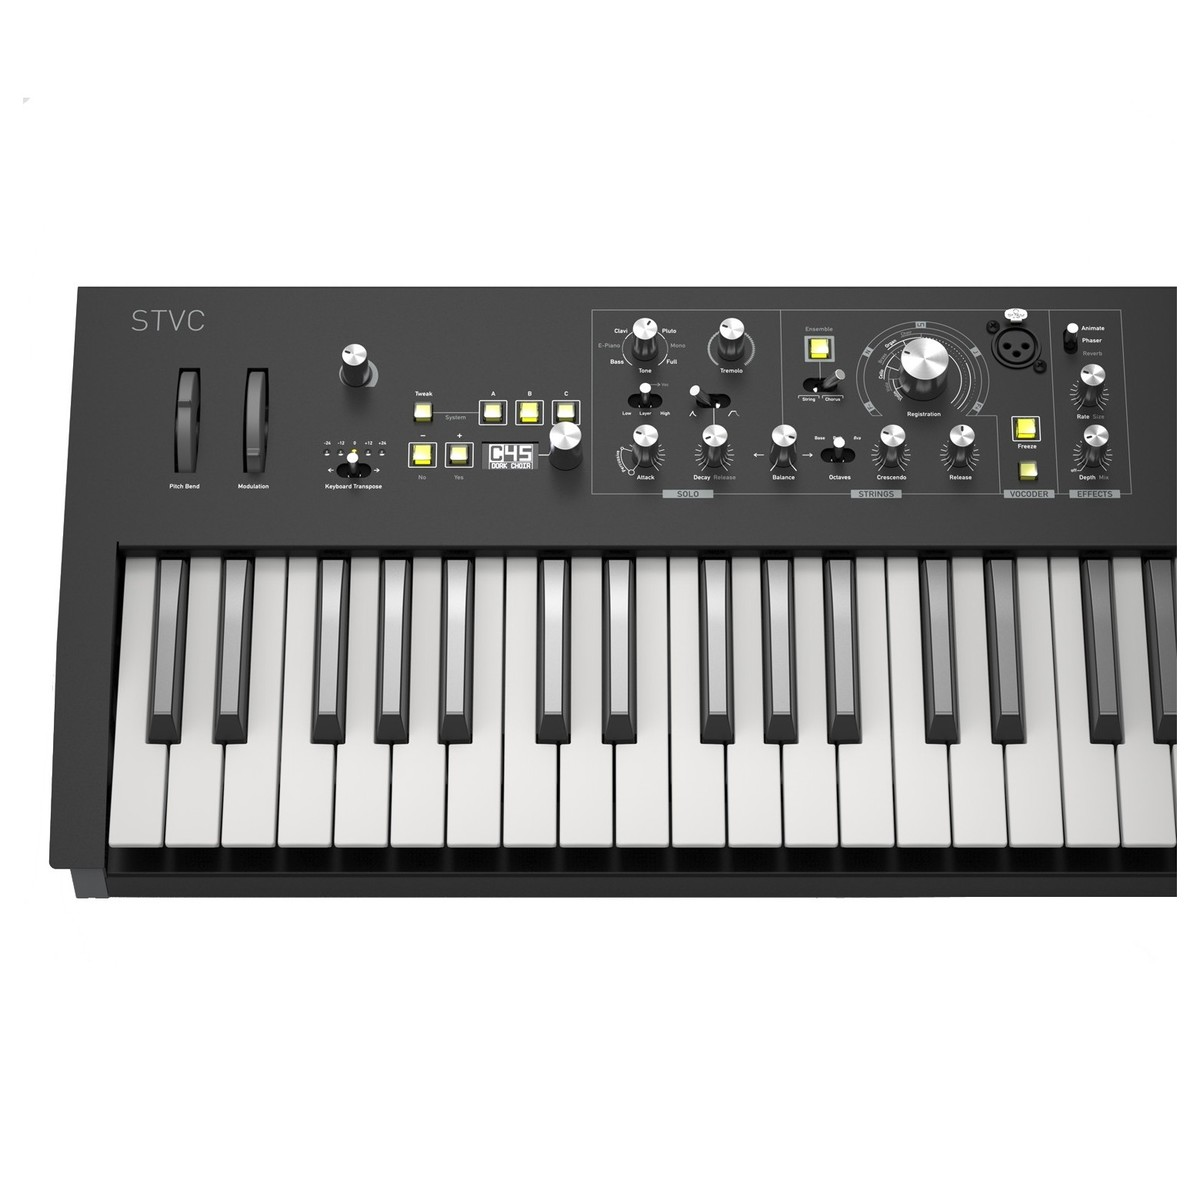 ELKA Rhapsody 610 The Rhapsody String synthesizer - Catawiki